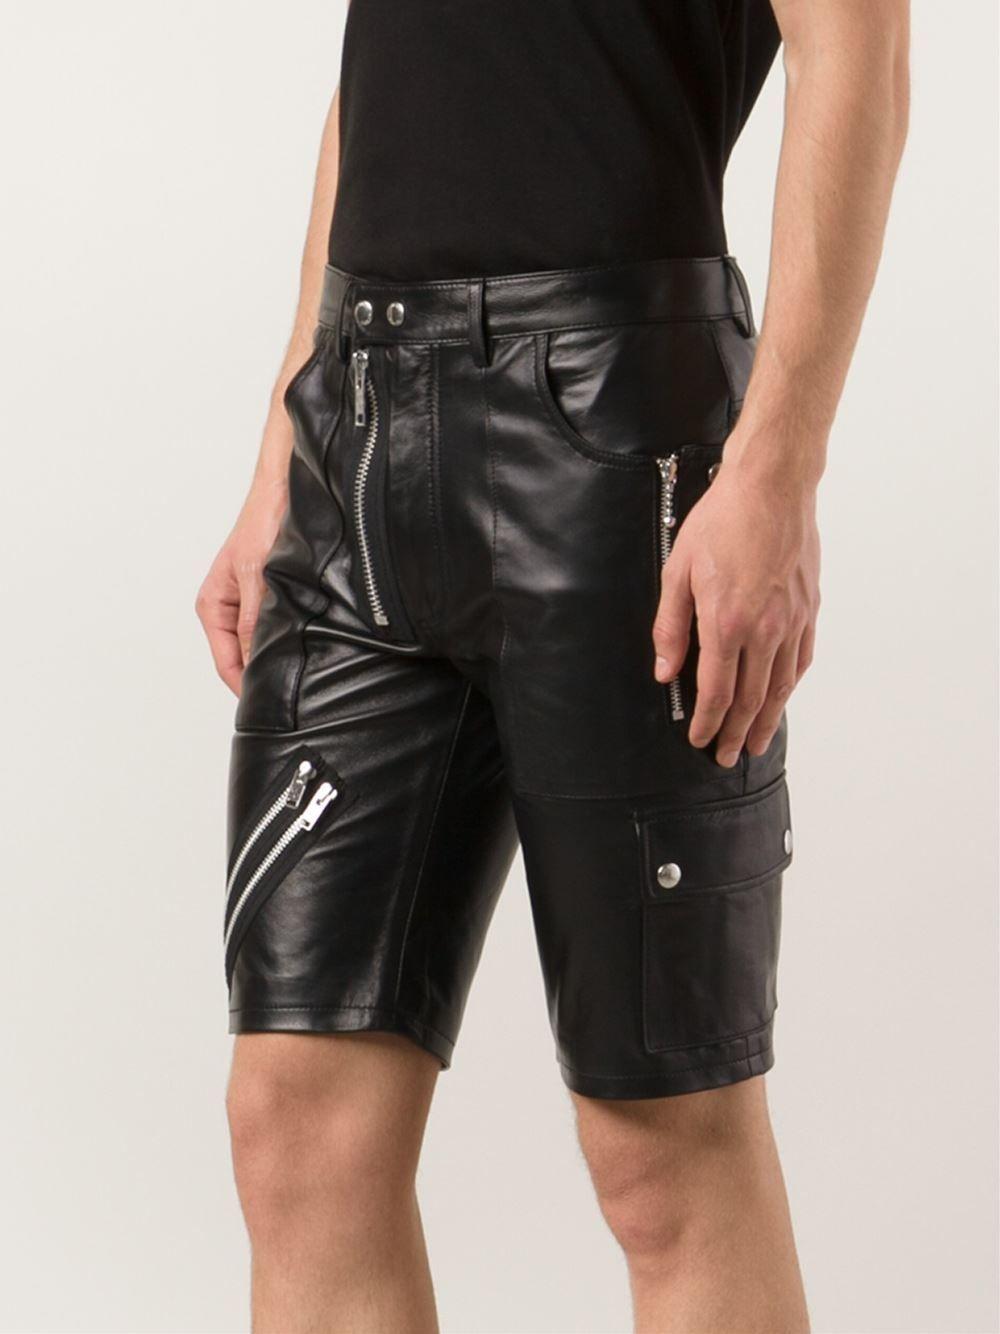 99 is short zipp h lorenzo pantalon homme pinterest pantalon homme. Black Bedroom Furniture Sets. Home Design Ideas